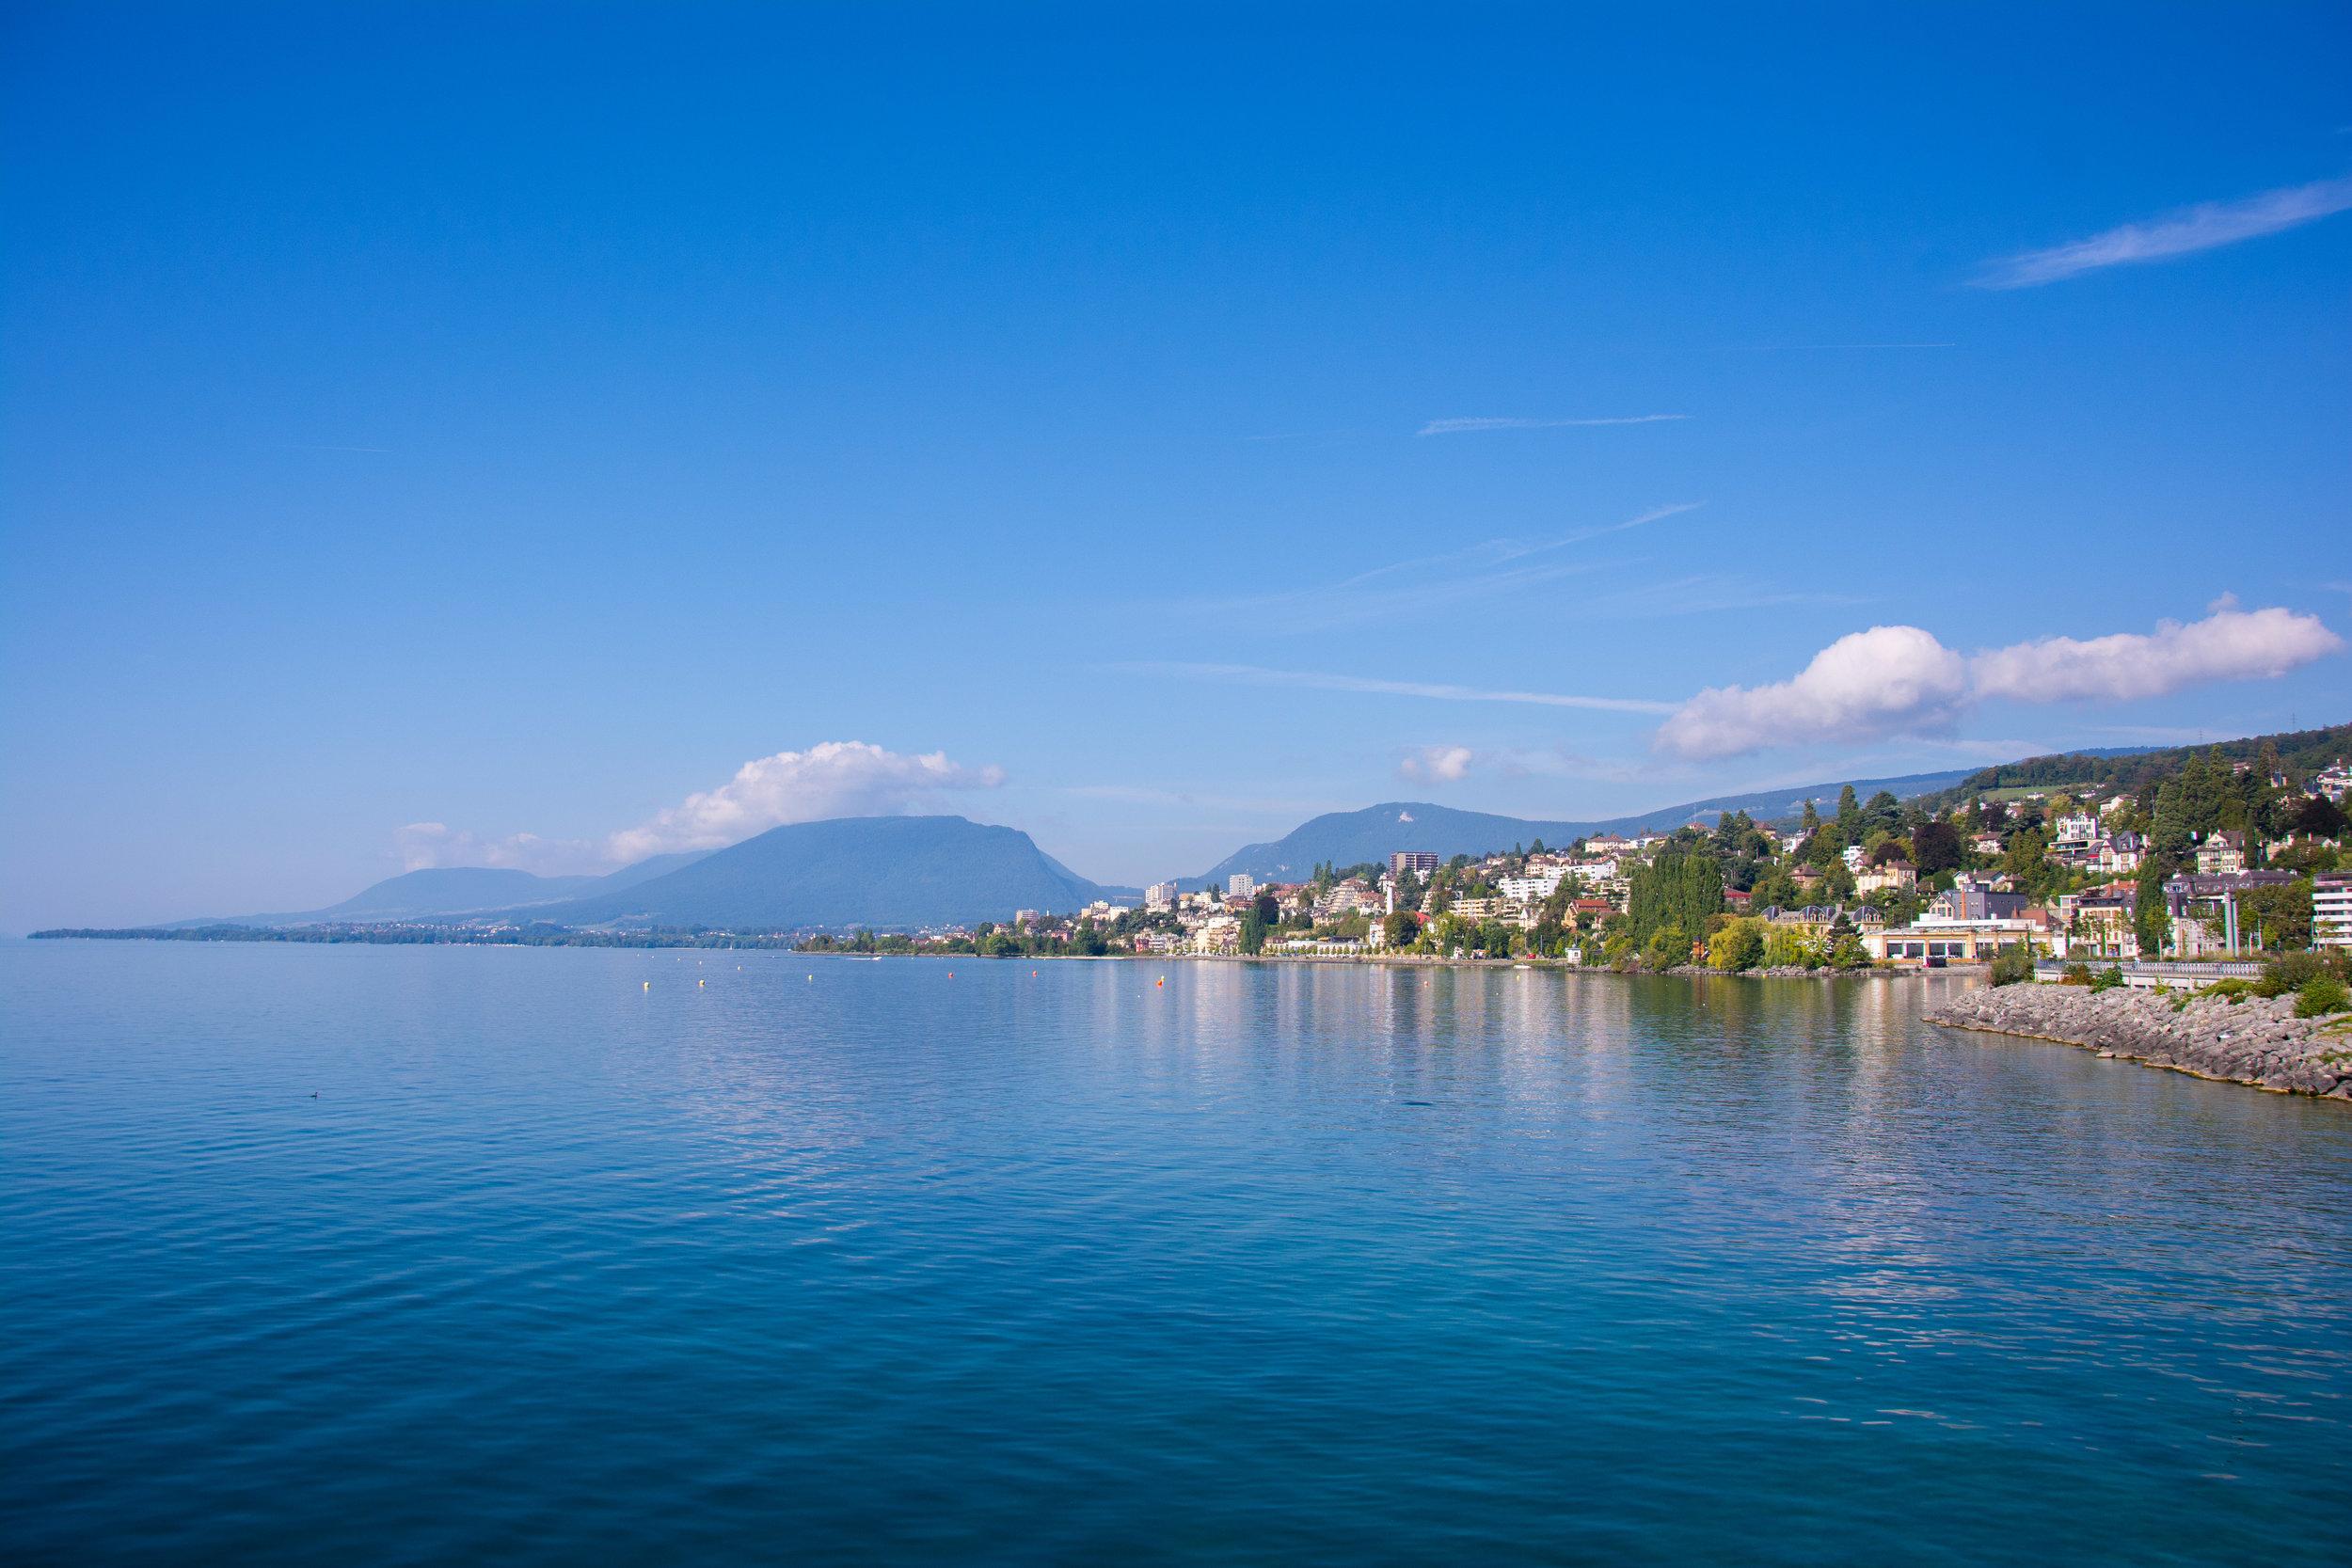 The Lake Toward Lausanne